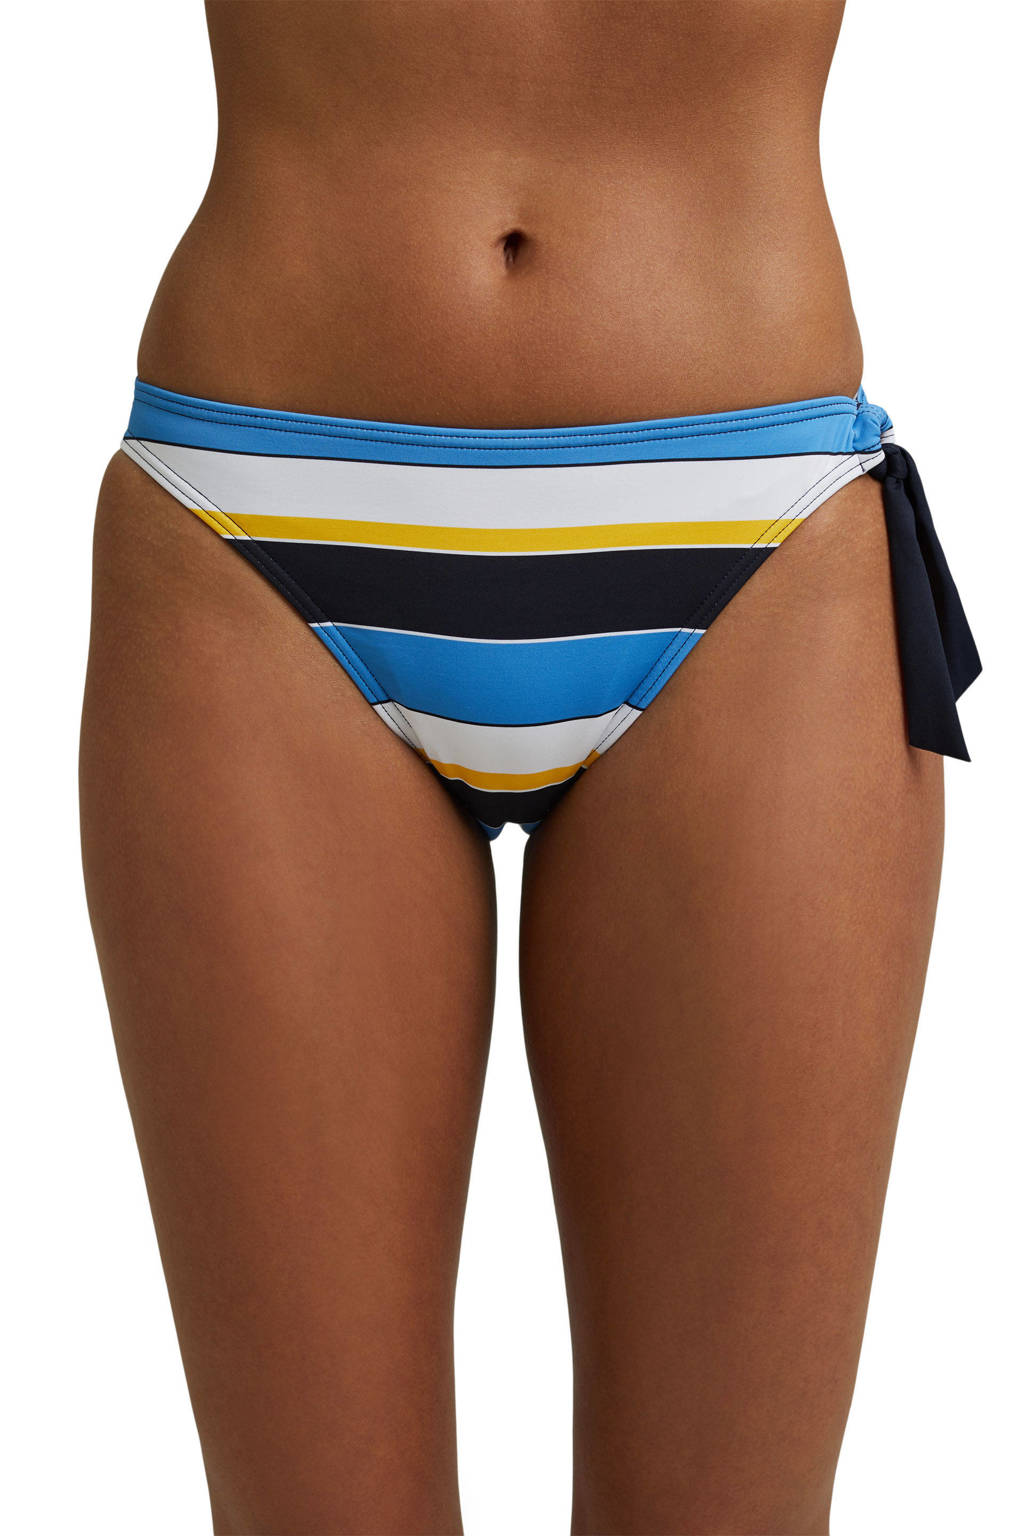 ESPRIT Women Beach gestreept strik bikinibroekje Brendon donkerblauw/blauw/wit, Donkerblauw/blauw/wit